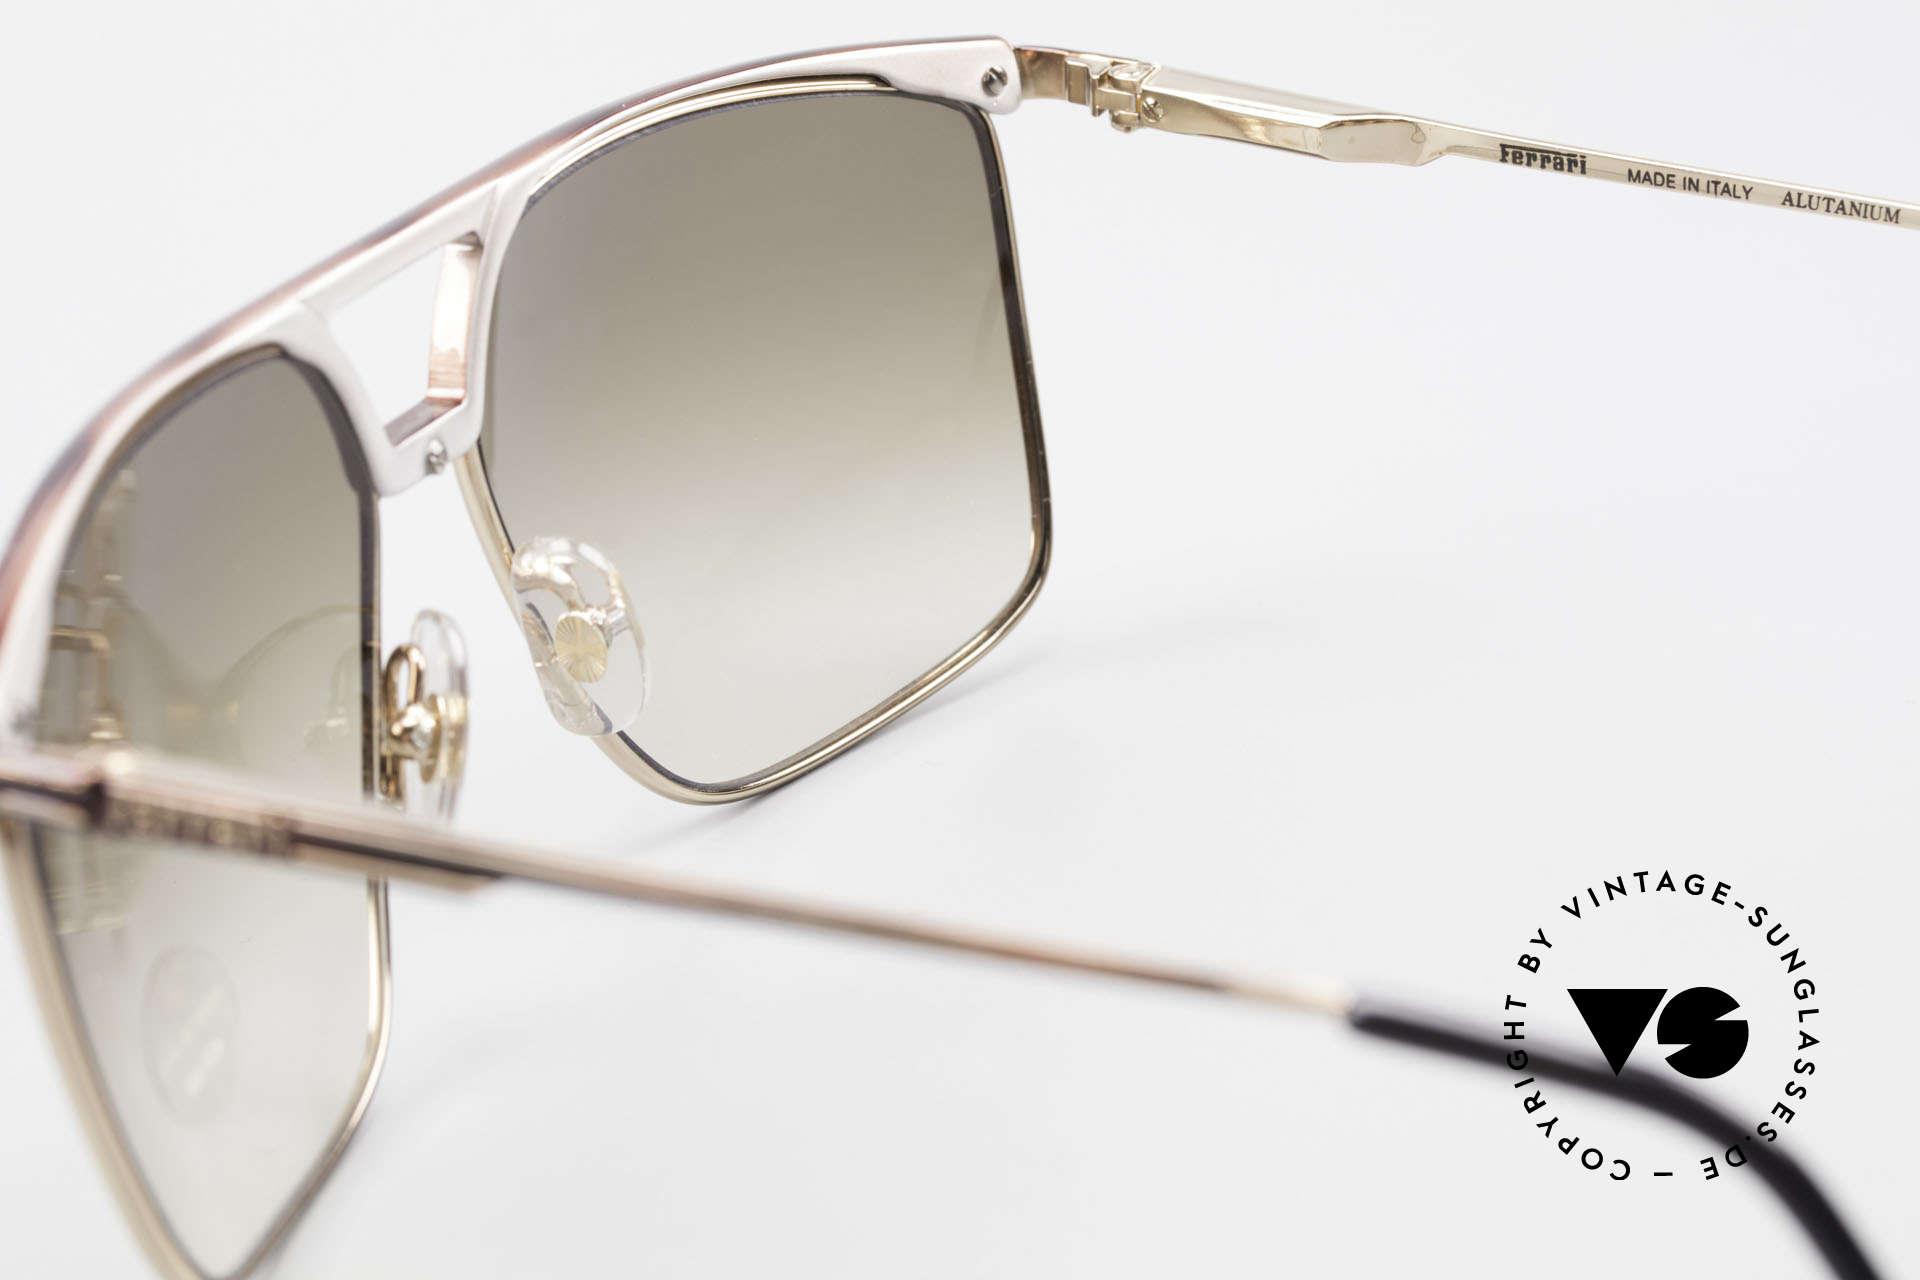 Ferrari F35 Alutanium Sunglasses X-Large, top-notch quality; X-large size 64-13, 140, F35, col 33E, Made for Men